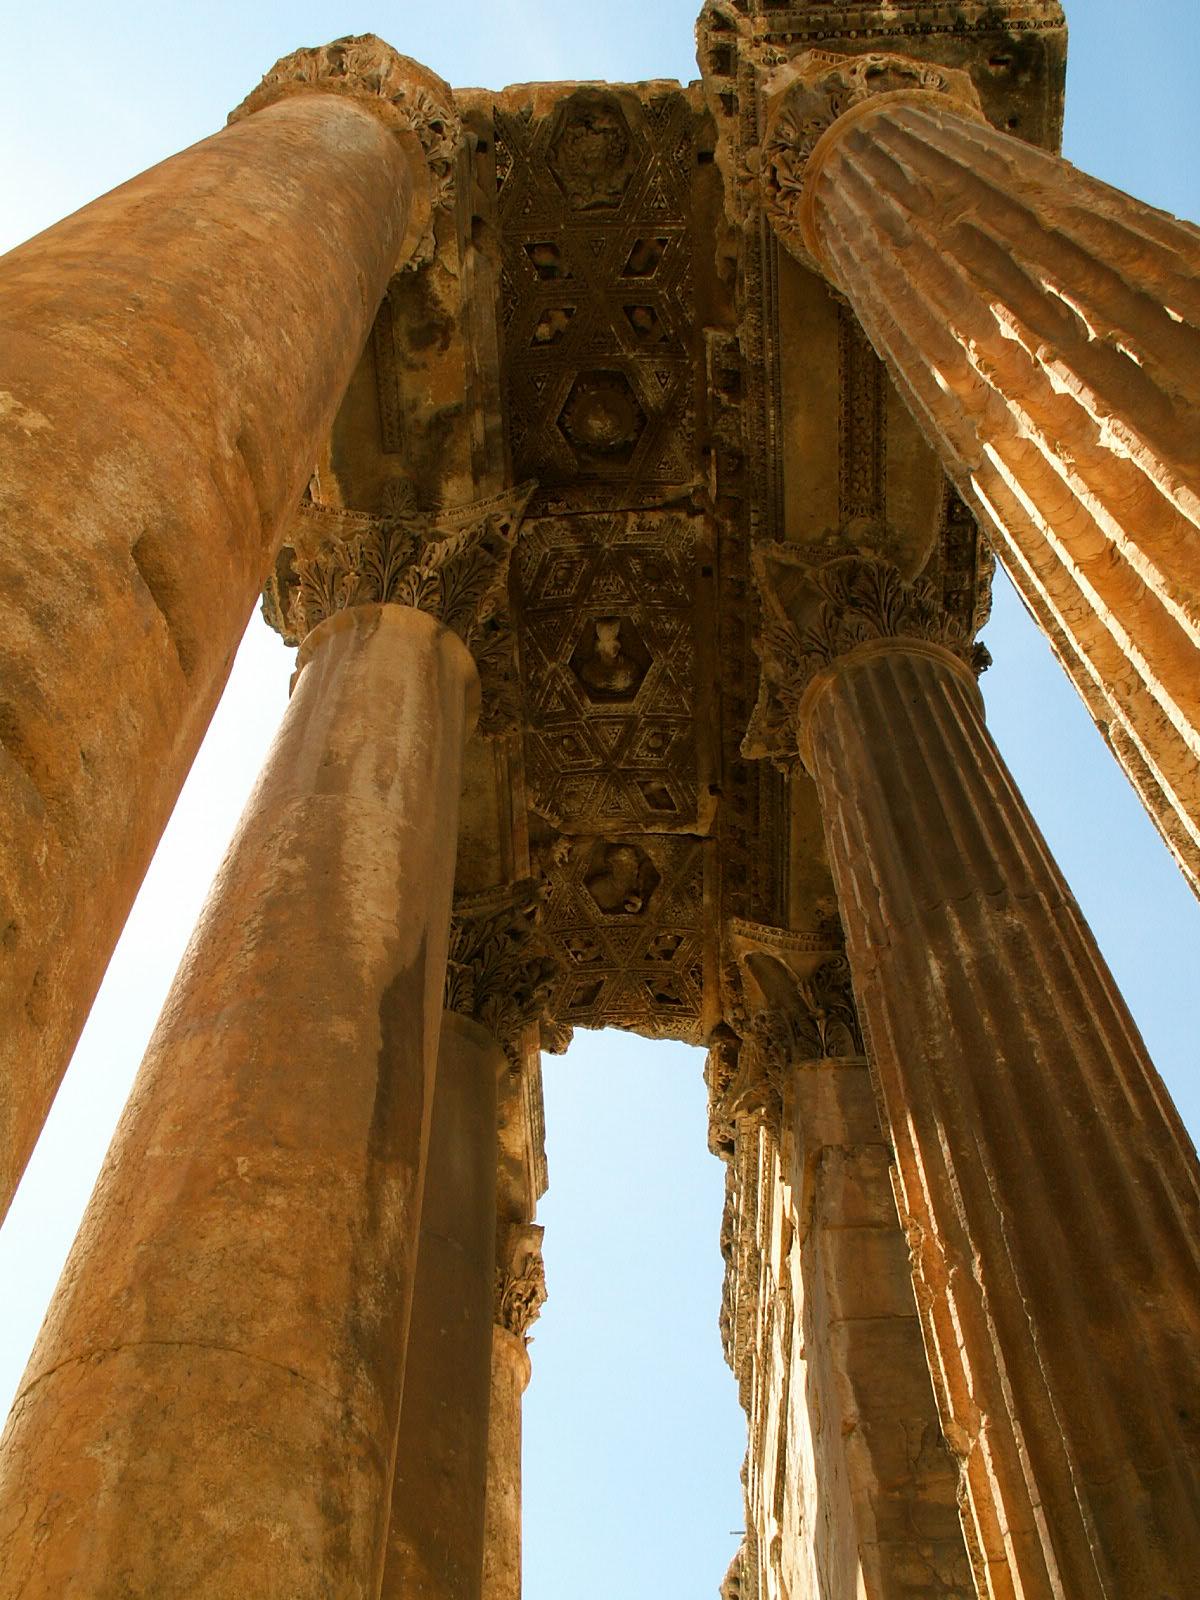 Massive Stone Monuments of Baalbek